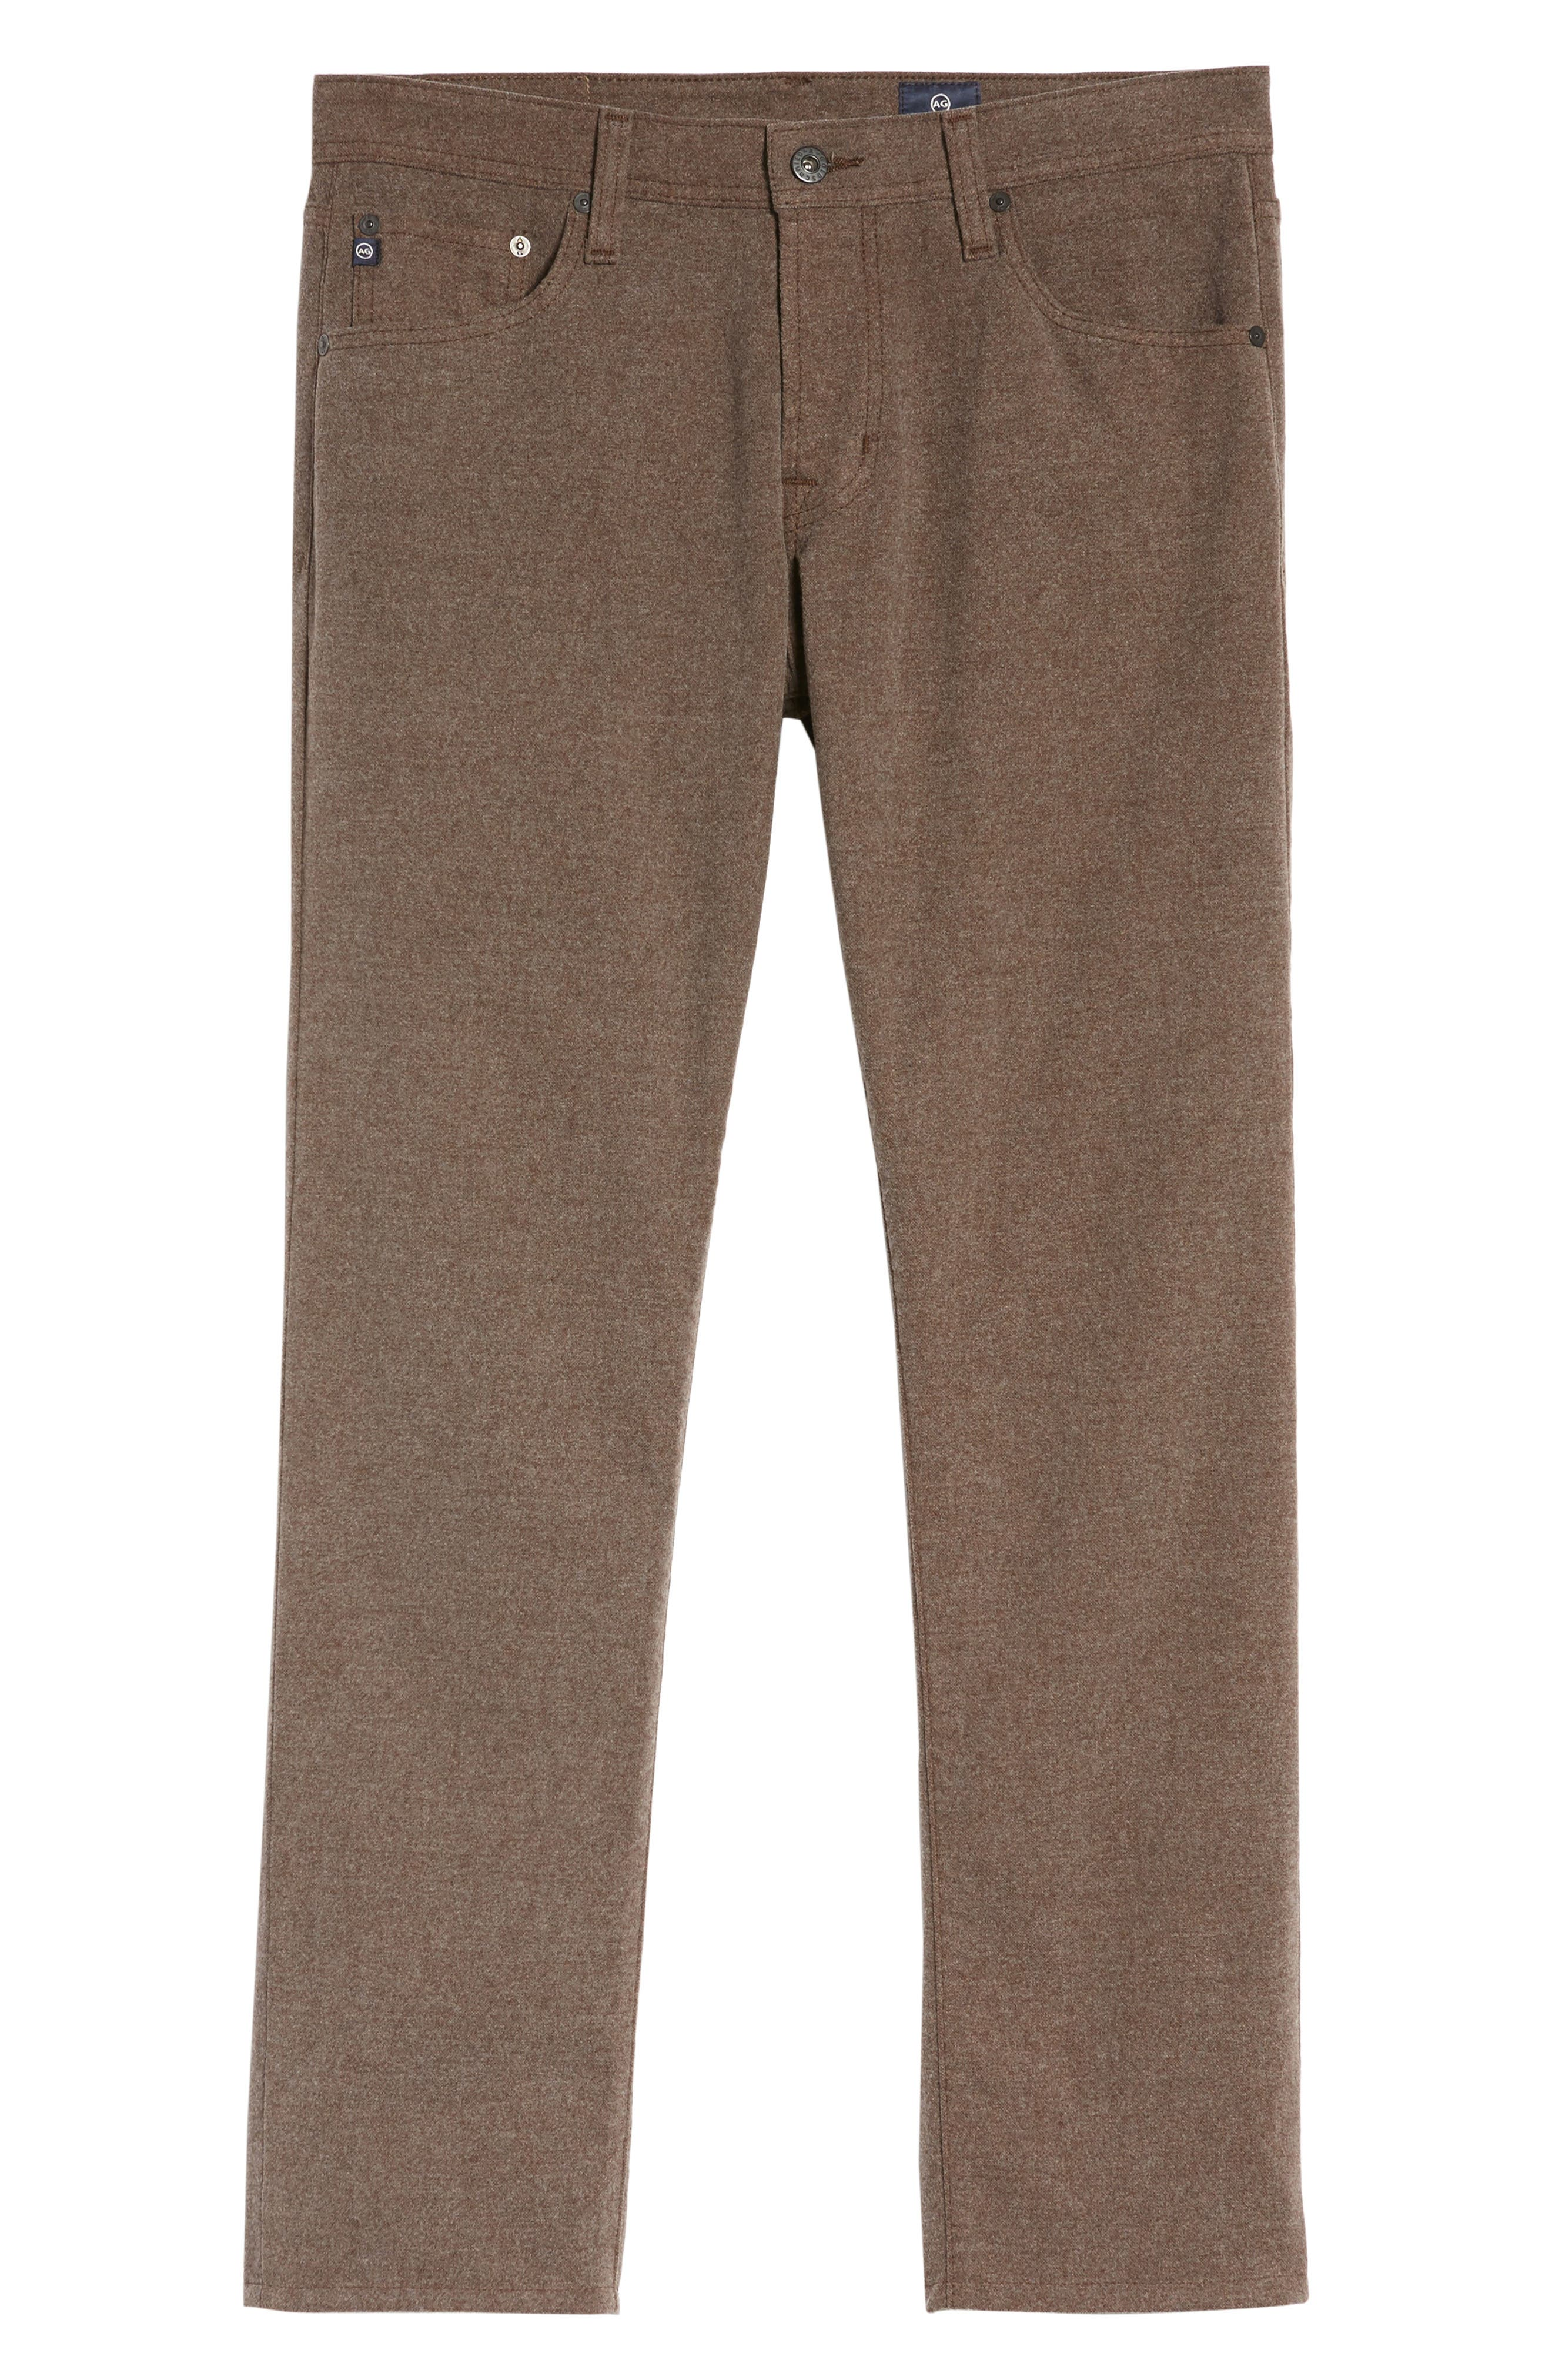 Tellis Slim Fit Five-Pocket Pants,                             Alternate thumbnail 23, color,